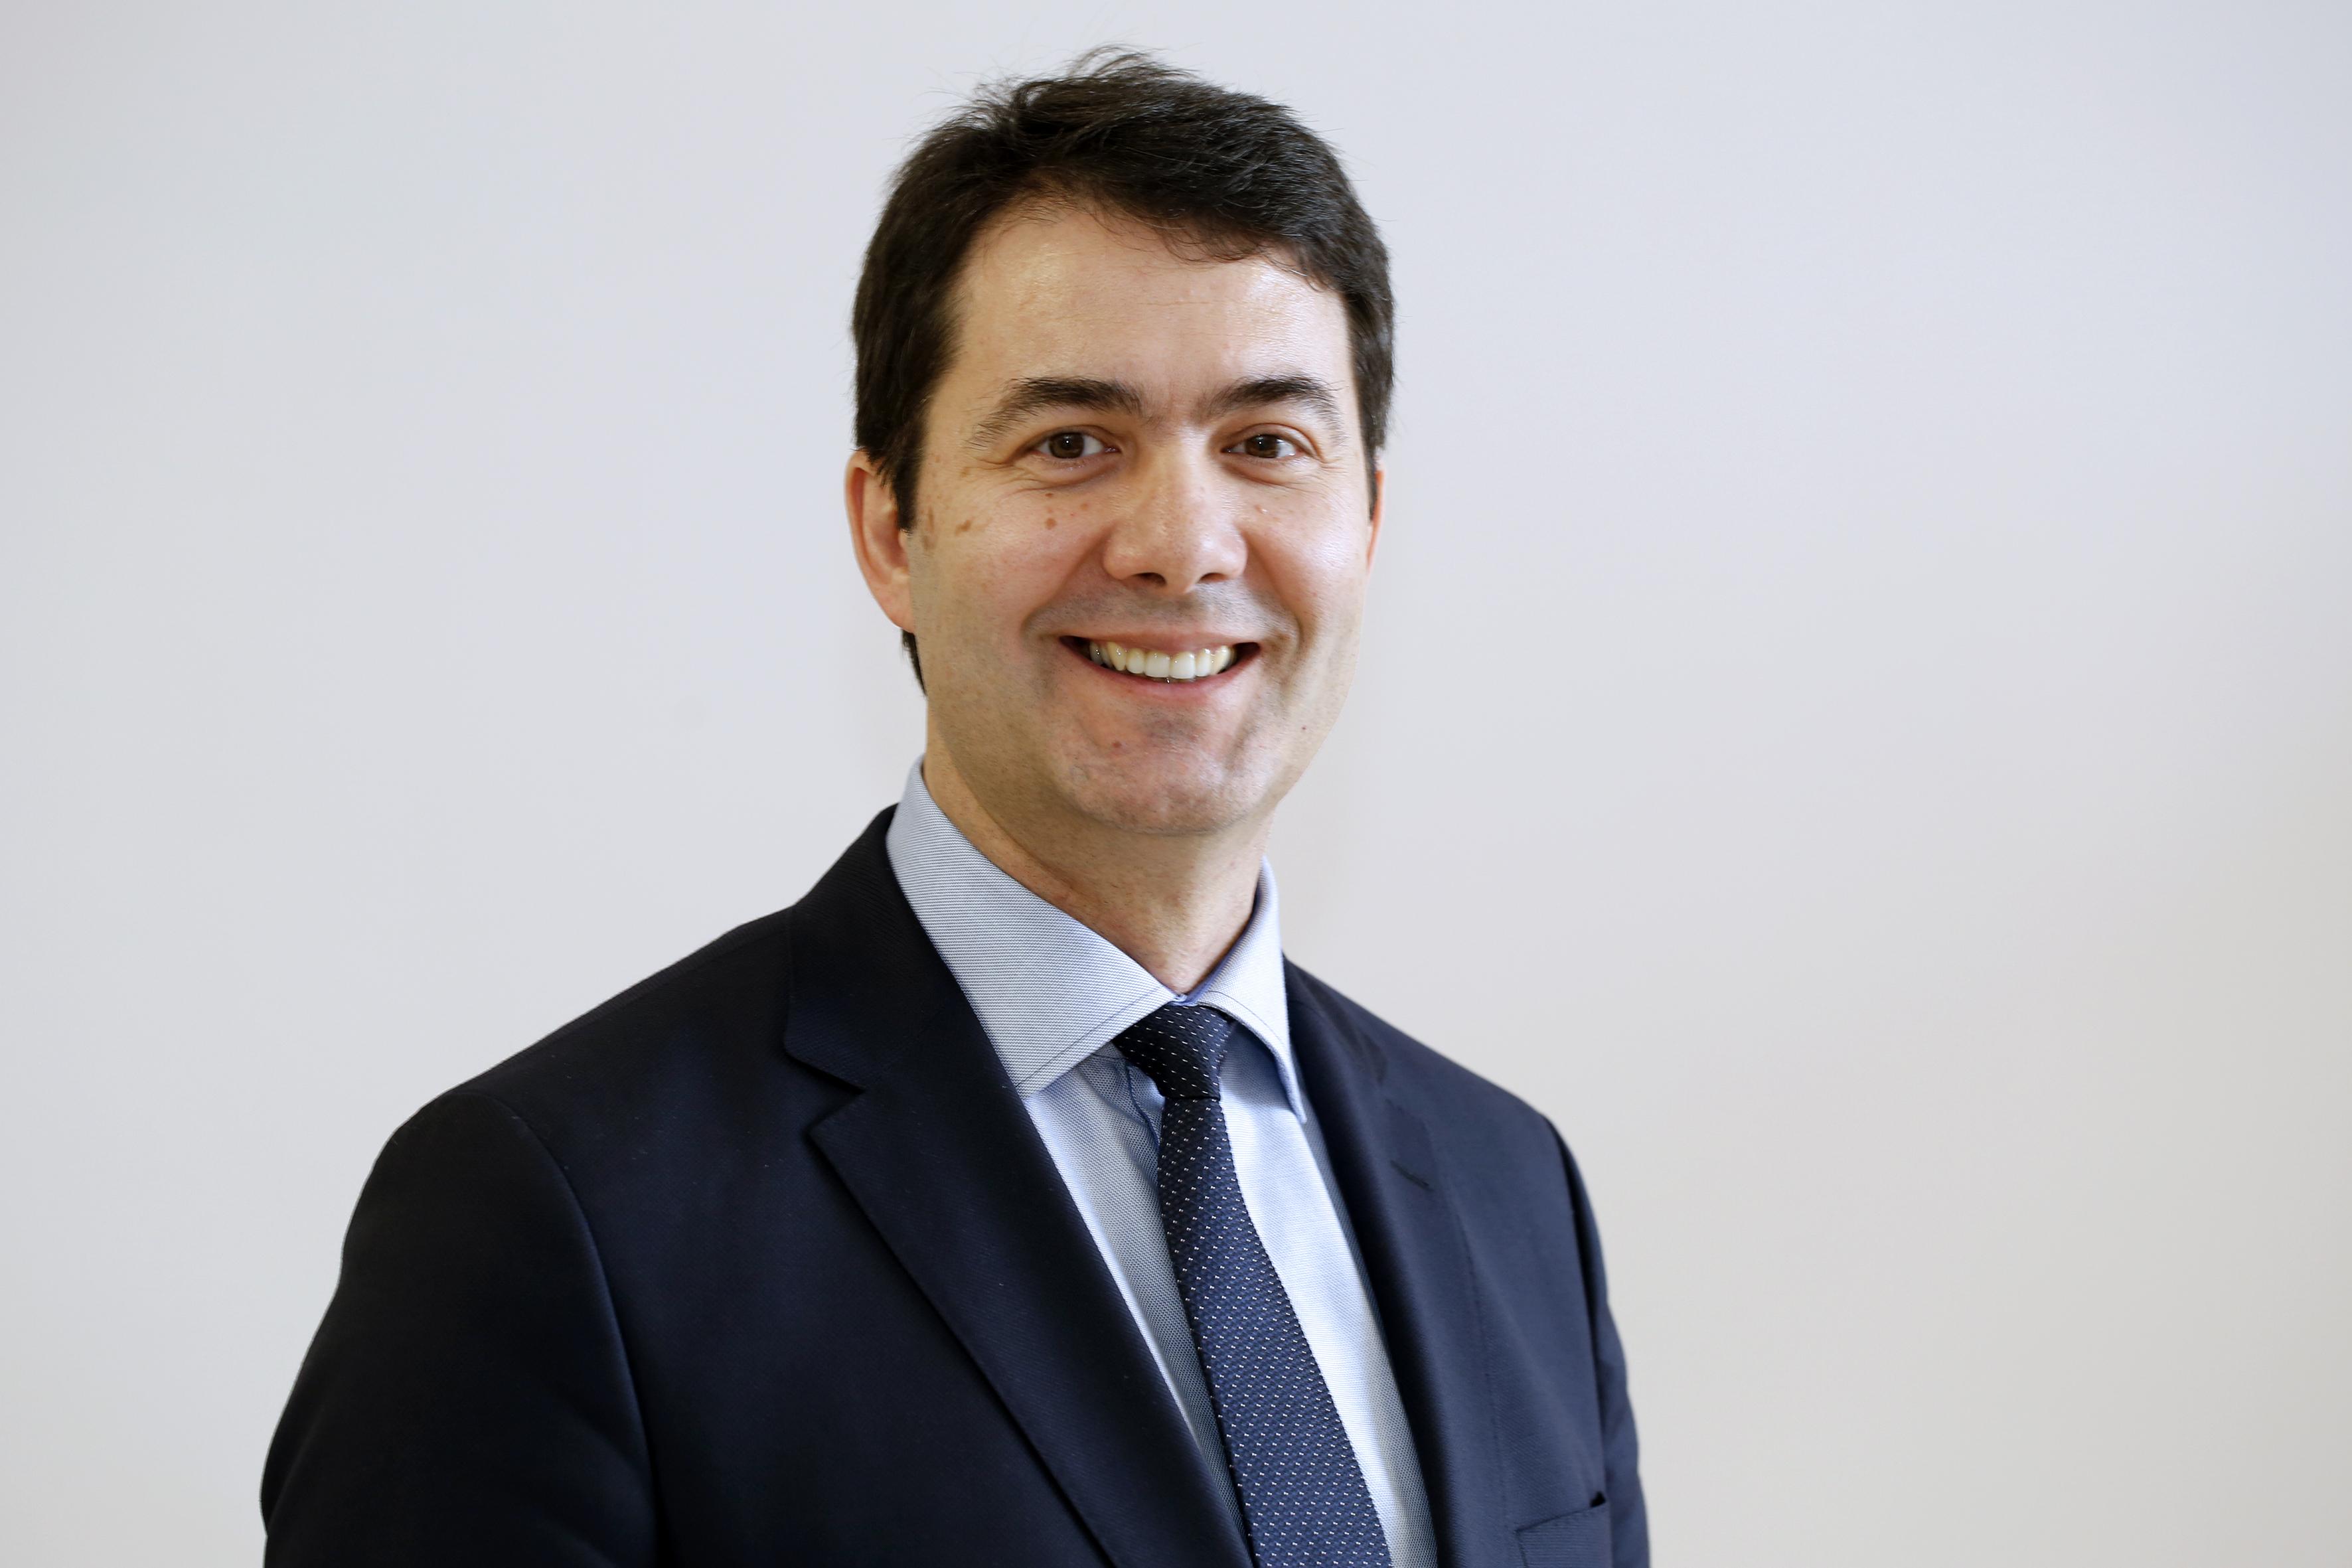 prof. dr. sc. Zoran Đogaš